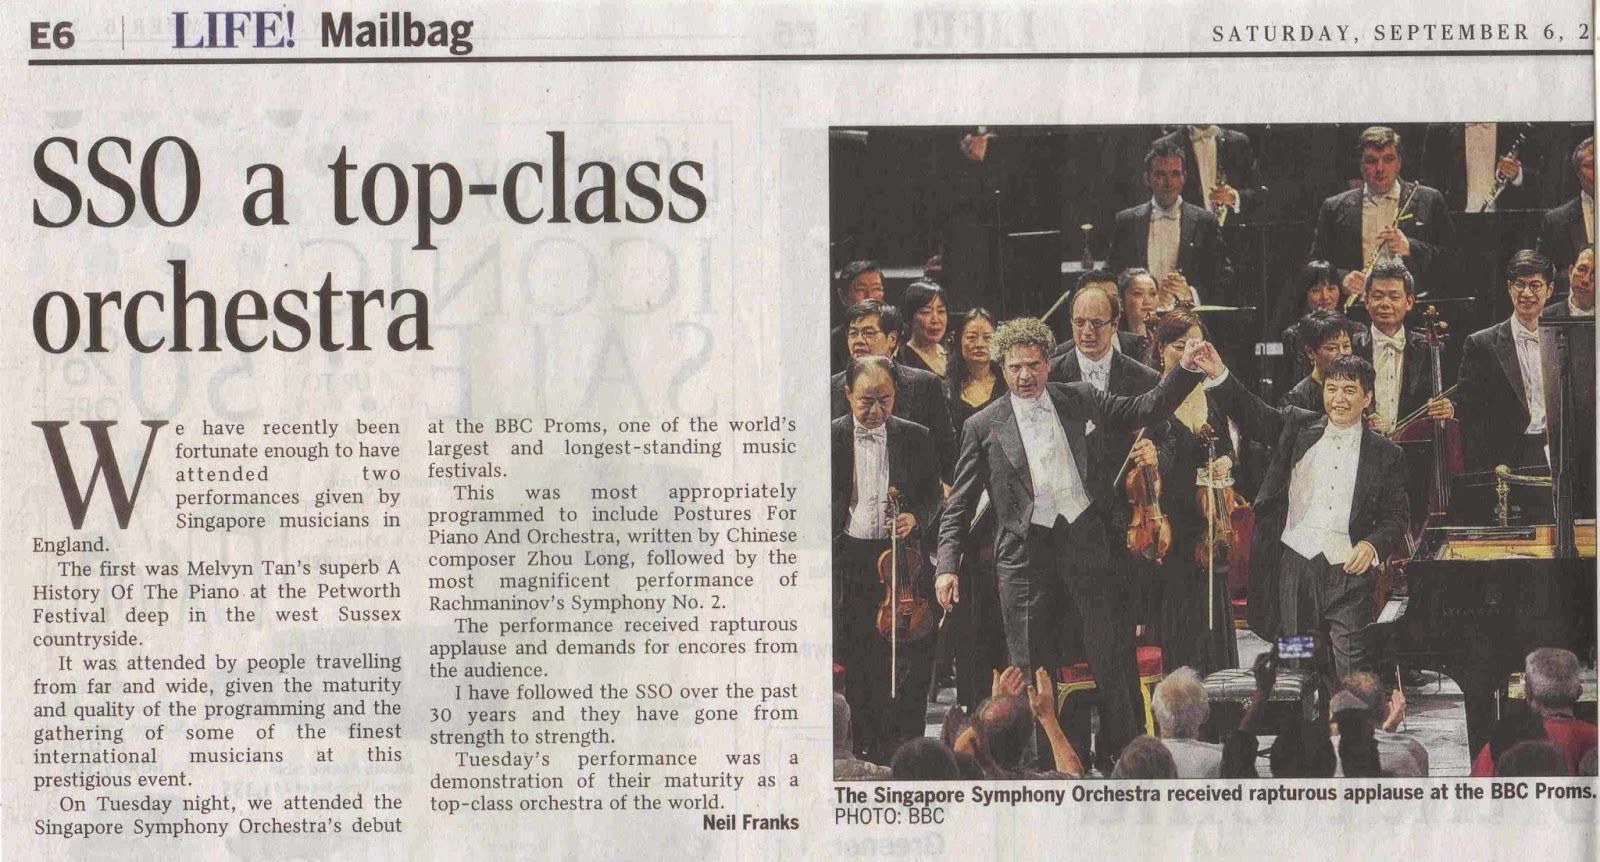 music appreciation concert report essay essay on classical music academic essay music appreciation concert review paper essays studymode